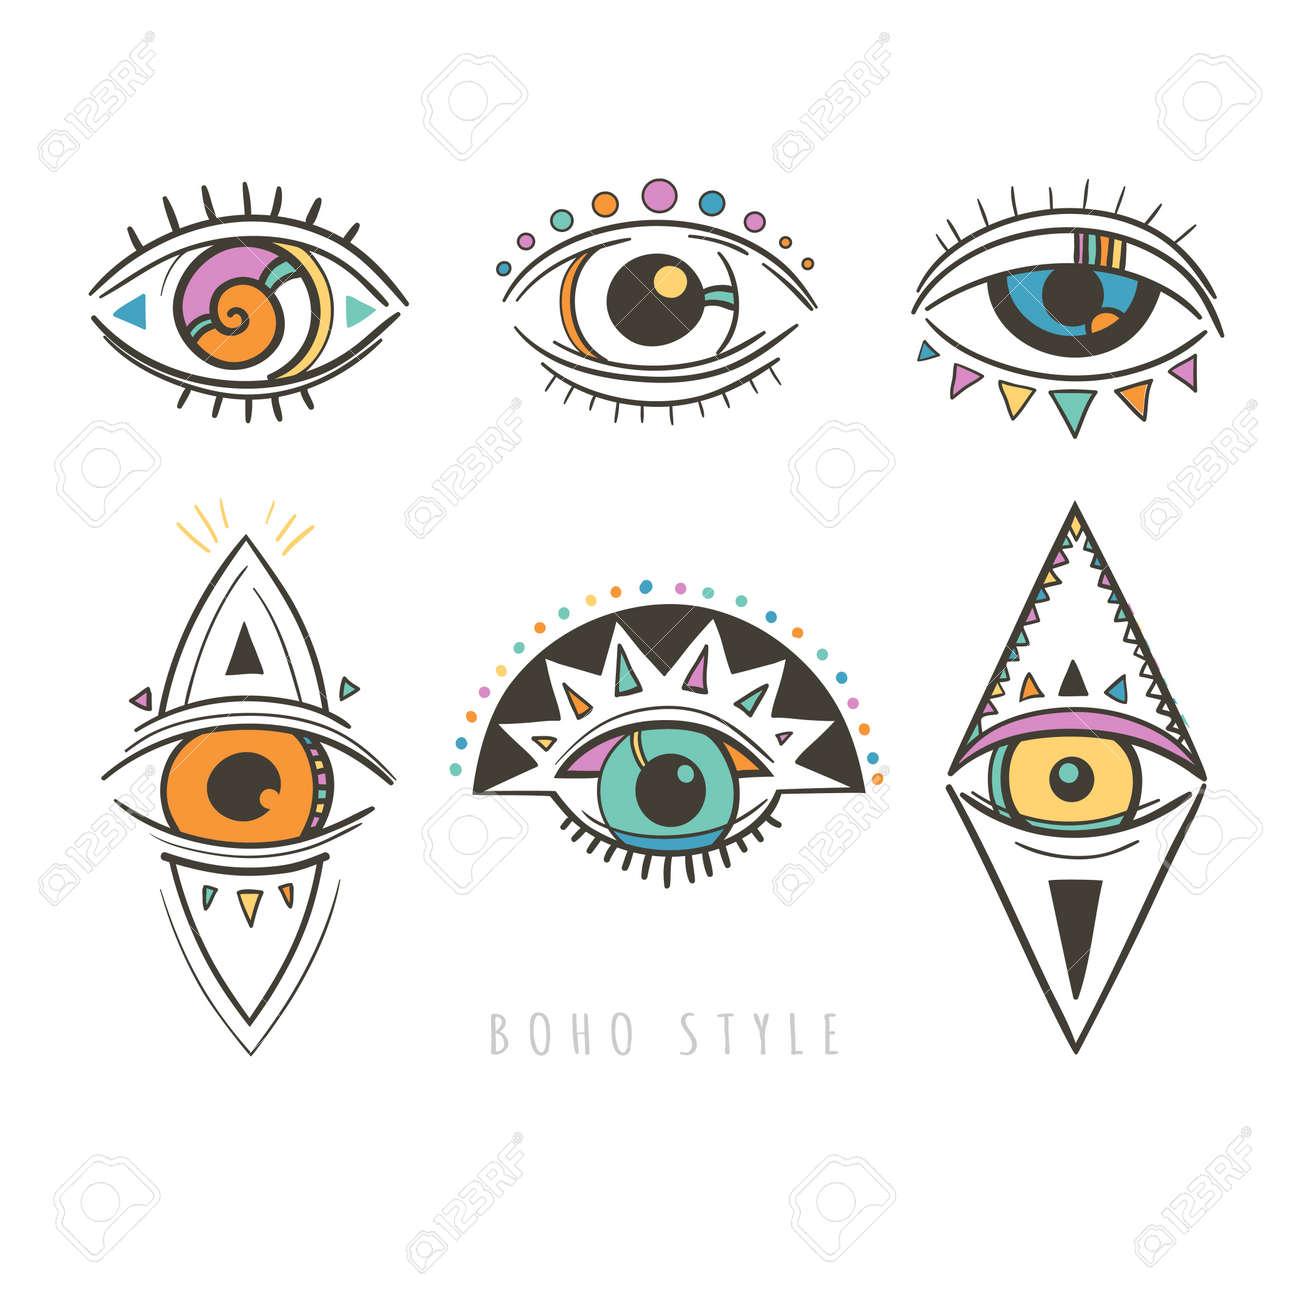 Hand Drawn Mystic Eyes Vector Illustration With Esoteric Symbols